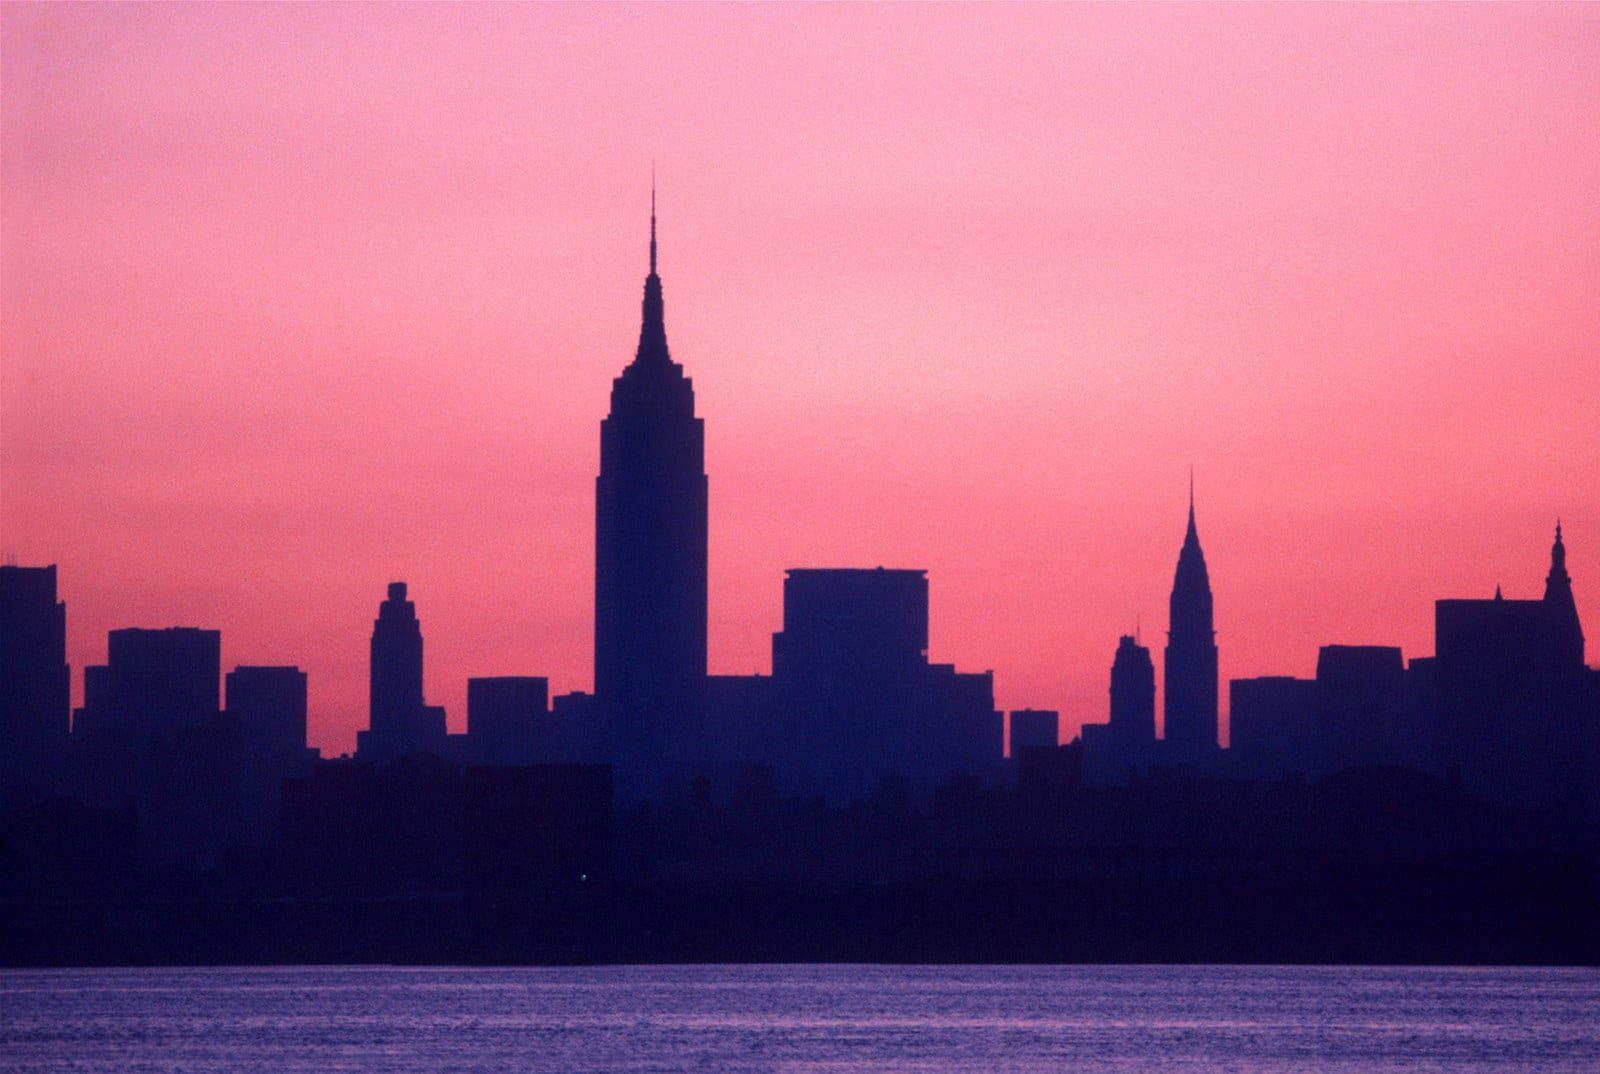 At dawn on July 14, the Manhattan skyline shows no lights